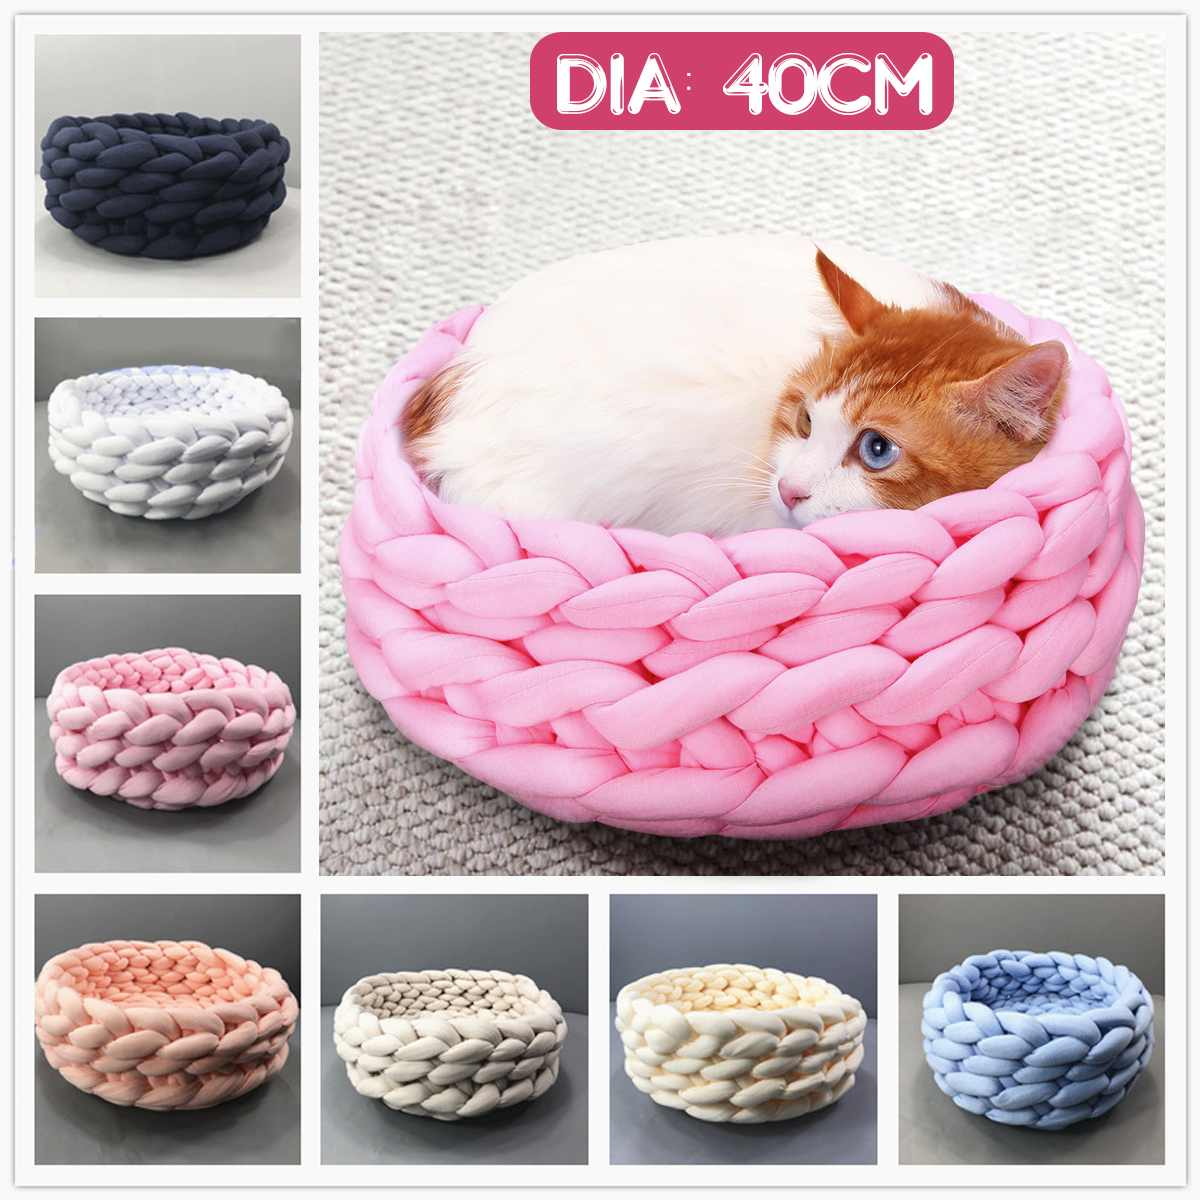 1 Pcs Soft Pet Hond Bed Ronde Kennels Handgemaakte Breien Grof Wol Huisdier Huis Warm Pluche Cozy Pet Hond Kat Nest Mat 40 Cm 50% Korting